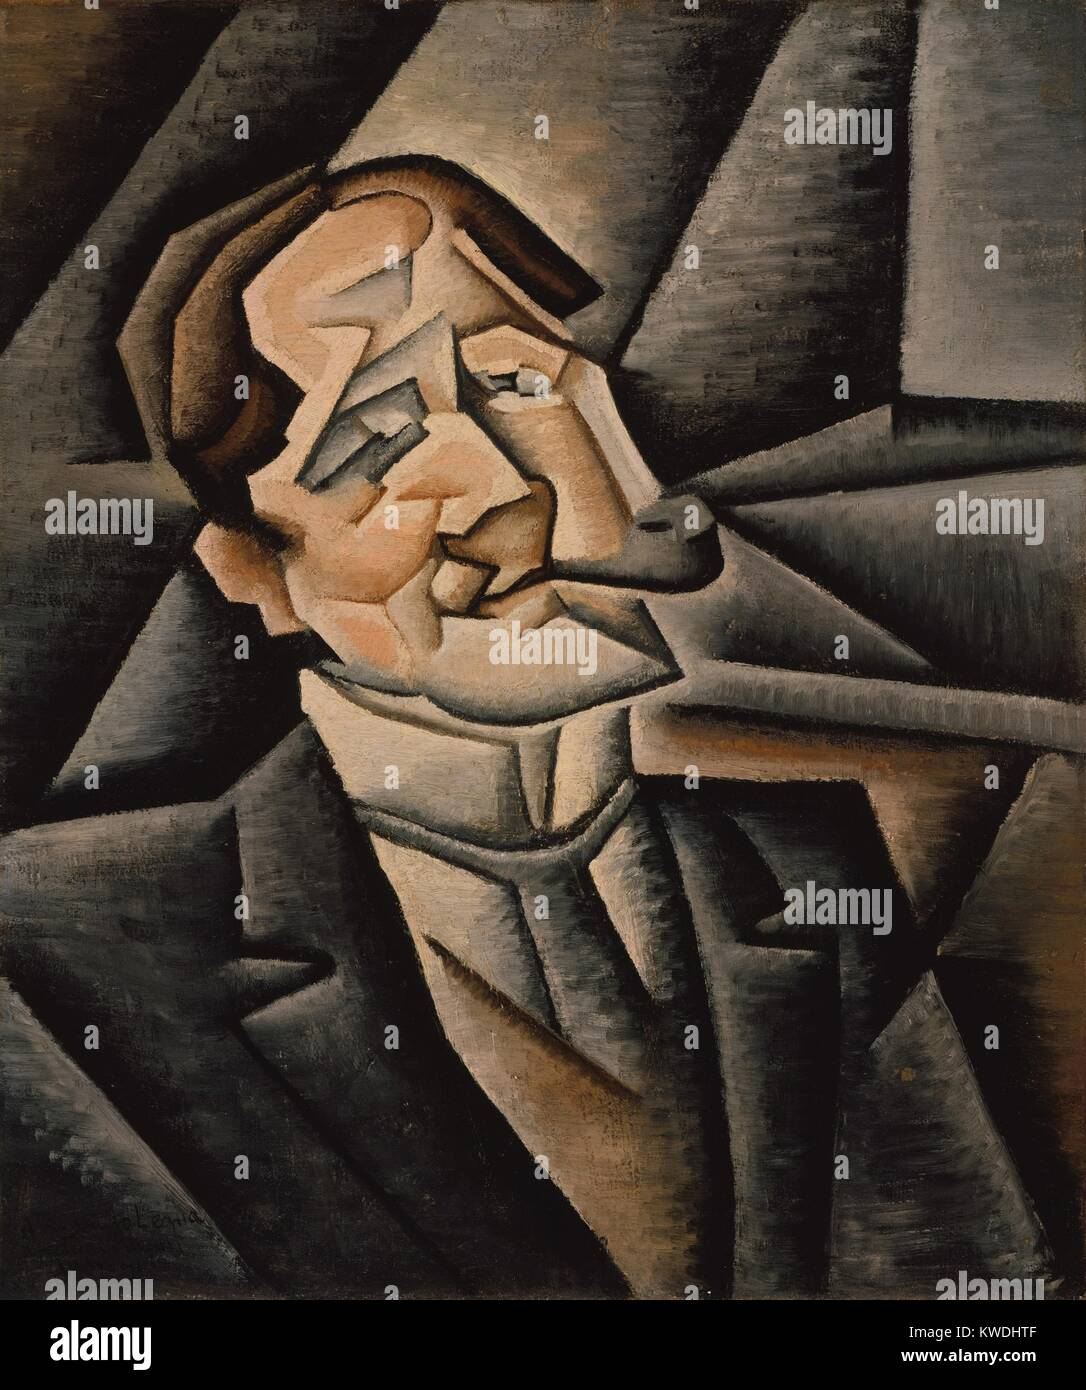 JUAN LEGUA, de Juan Gris, la pintura Cubista Español, 1911, óleo sobre lienzo. Retrato cubista analítico Imagen De Stock